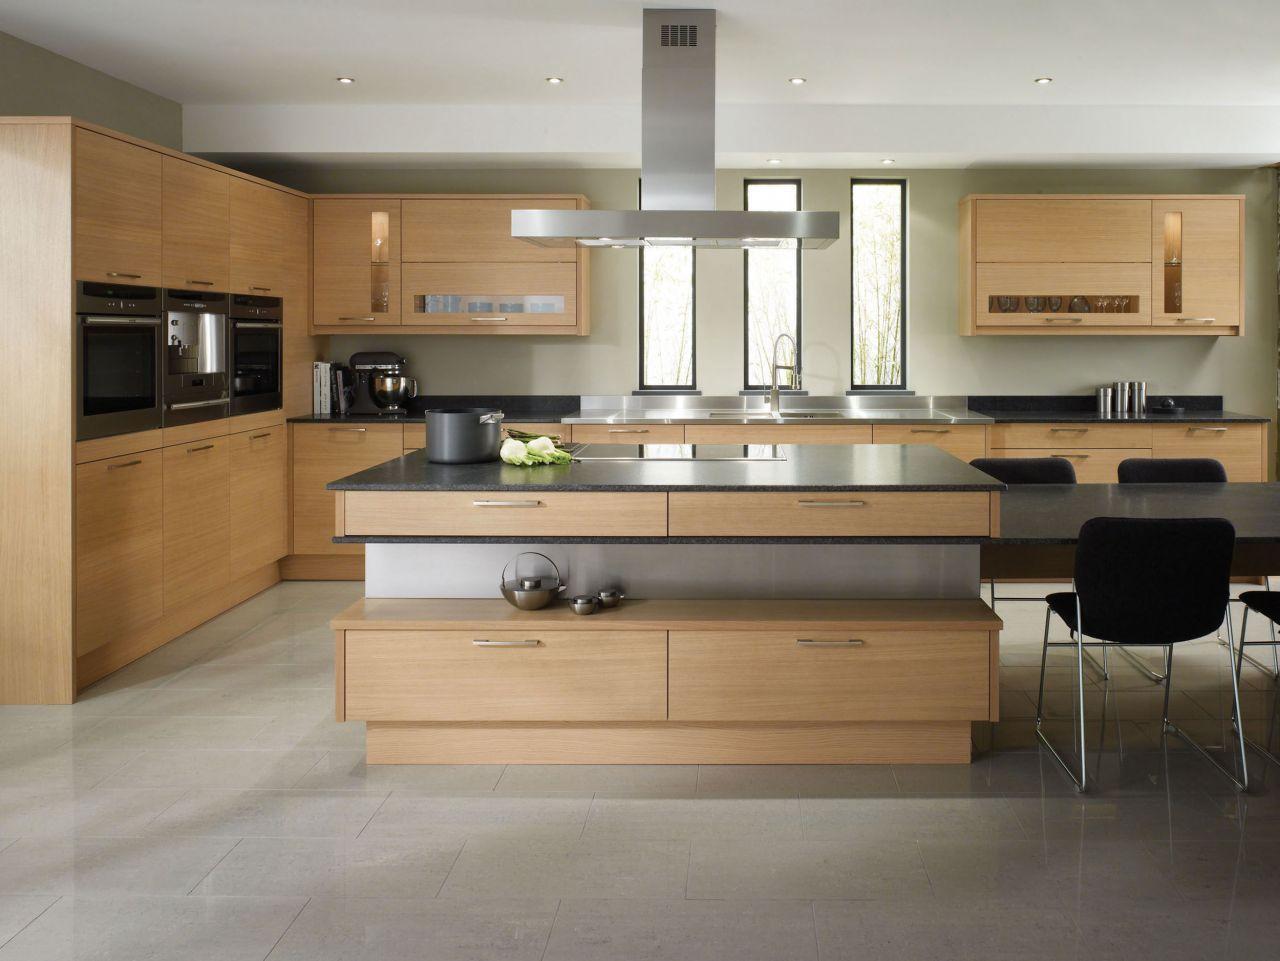 kitchen cool chrome euro free standing chimney kitchen on awesome modern kitchen design ideas id=22359